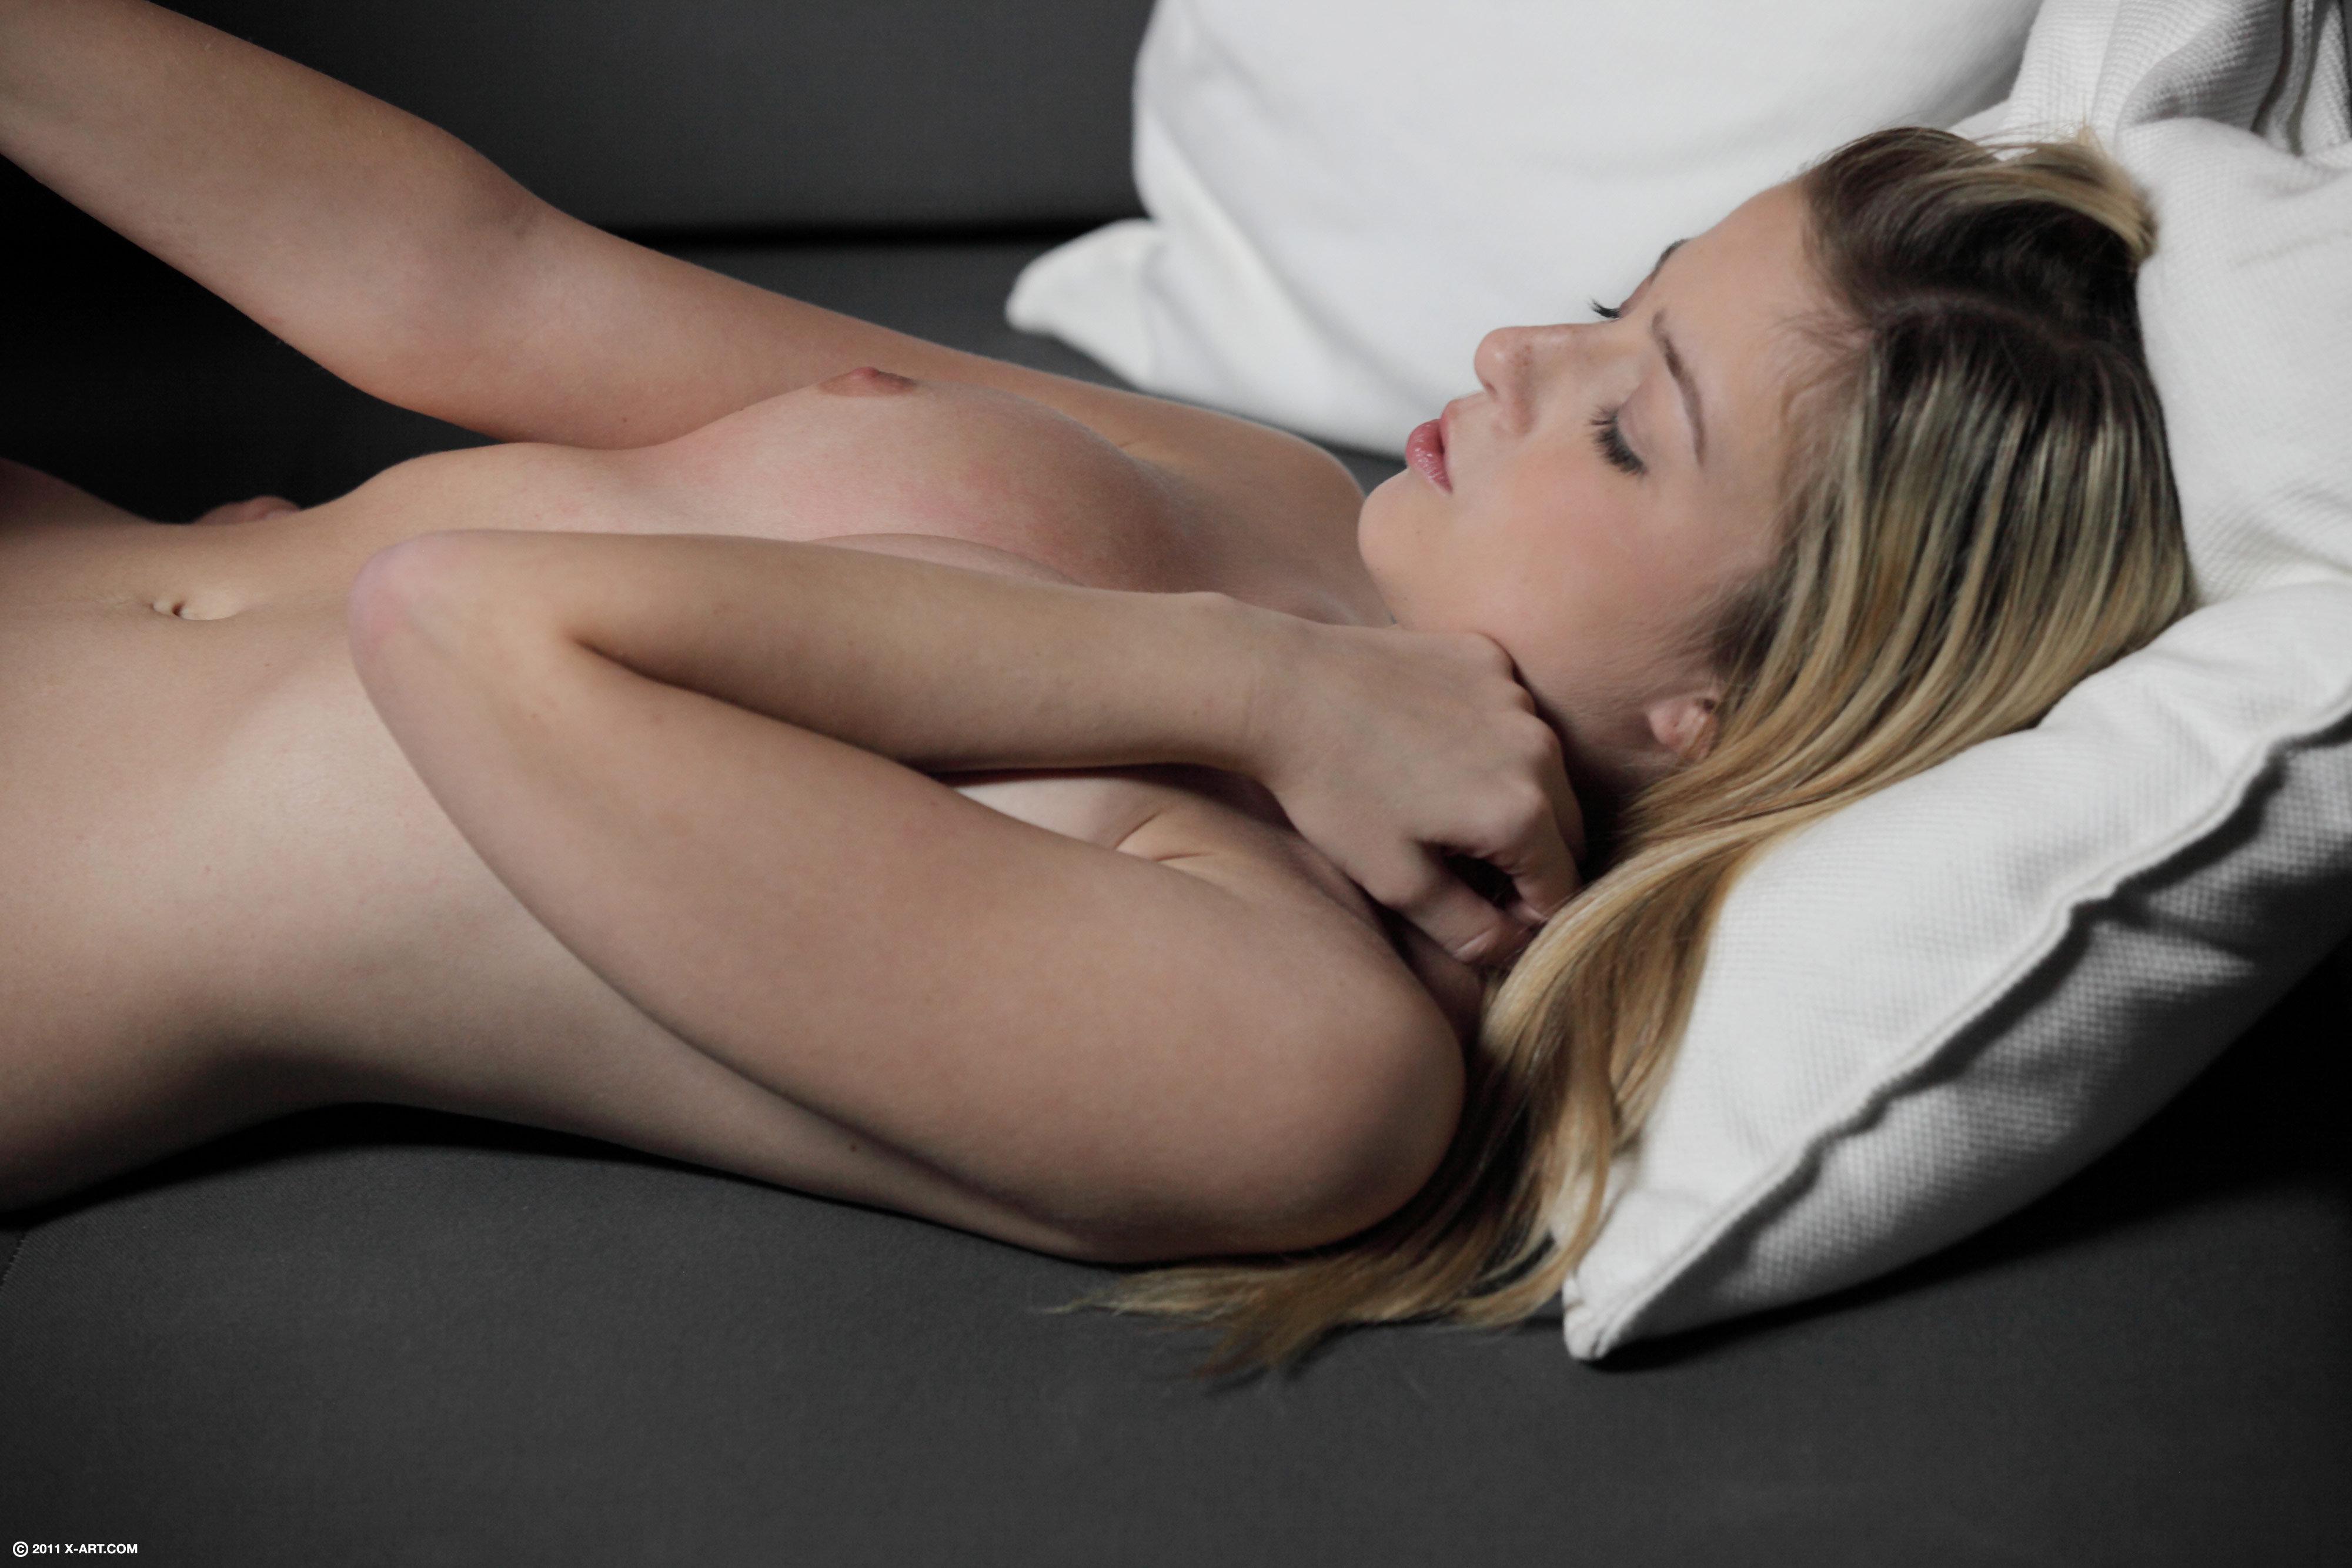 Daniela bianchi fake porn